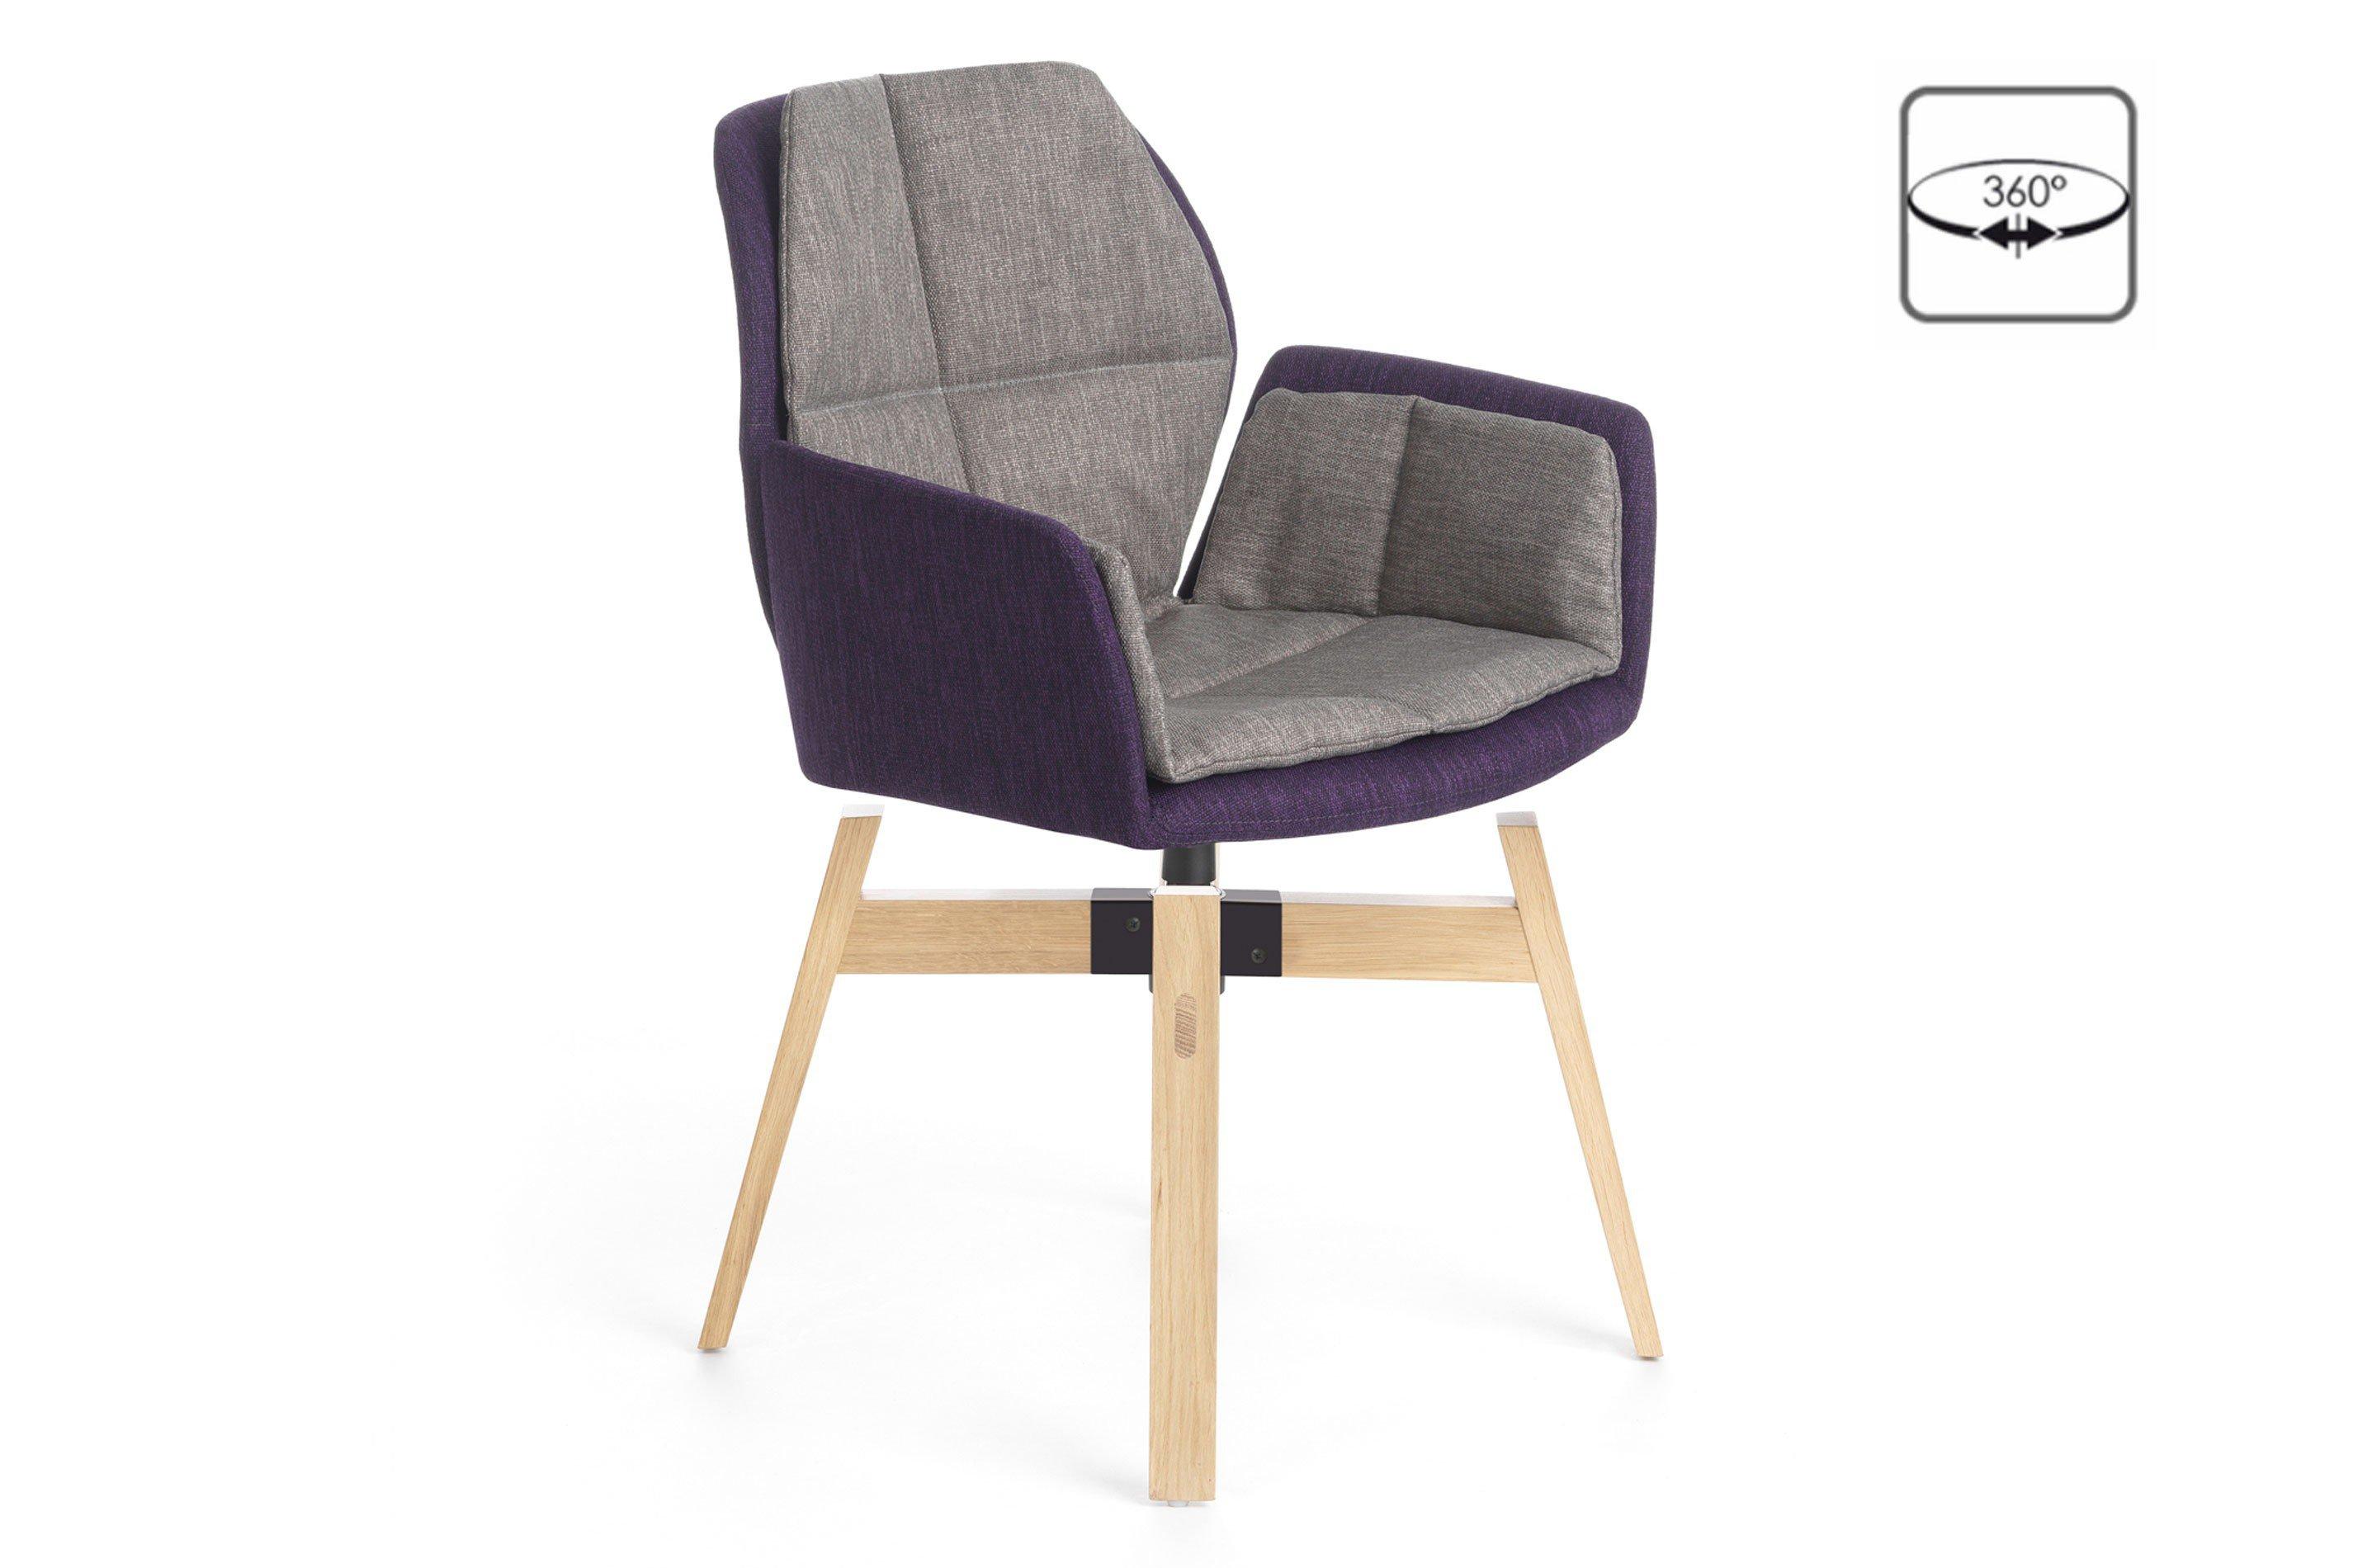 mobitec stuhl mood 96 bi eiche grey lila drehbar m bel letz ihr online shop. Black Bedroom Furniture Sets. Home Design Ideas